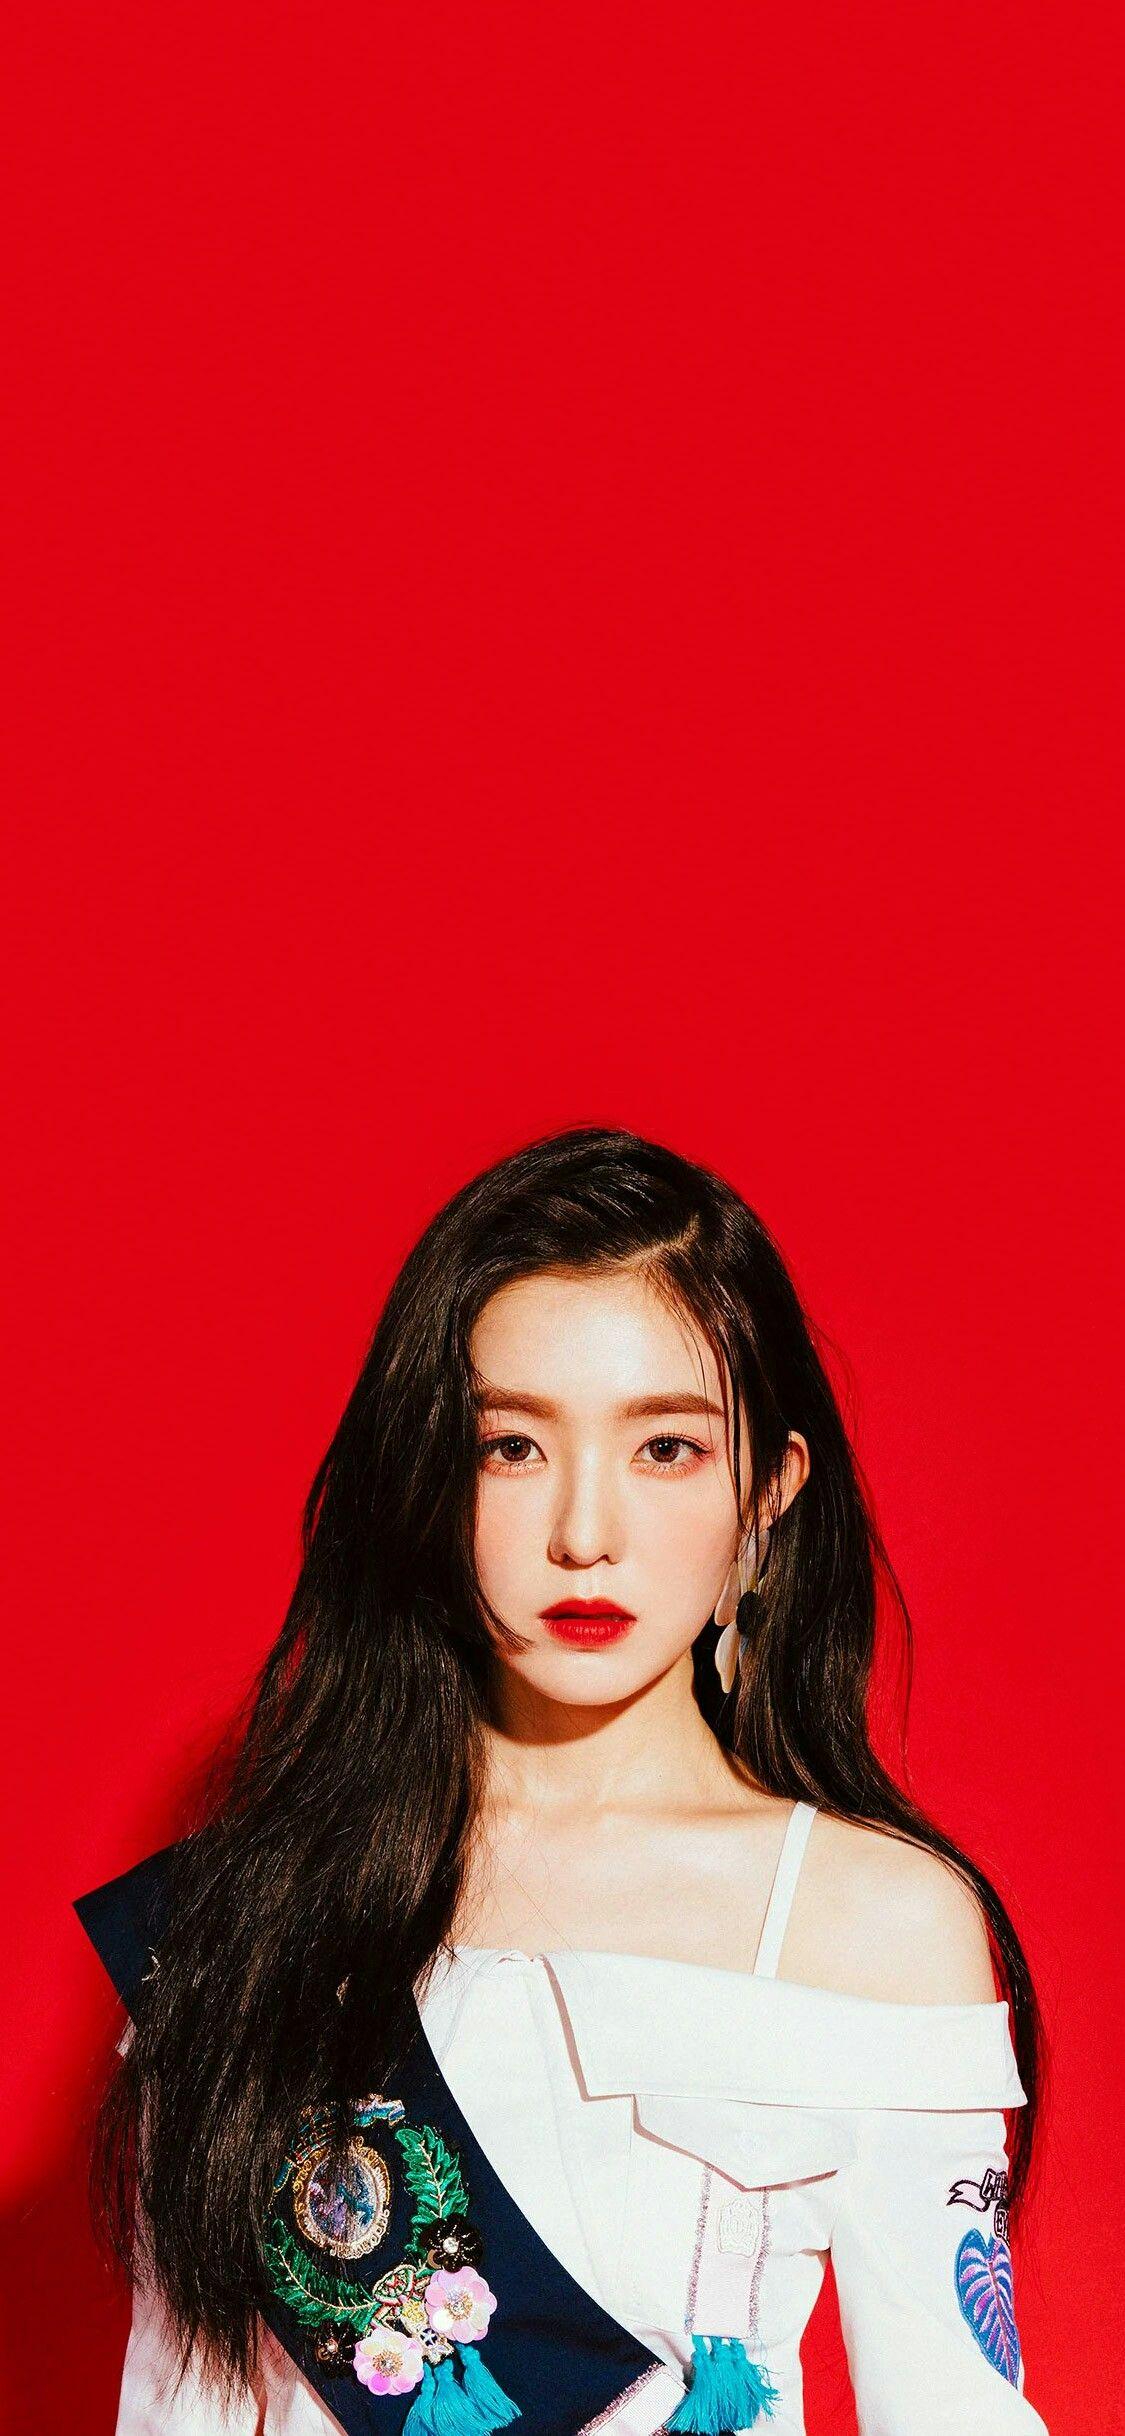 Red Velvet Seulgi Irene Wendy Yeri Joy Wallpaper Lockscreen Hd Fondo De Pantalla Iphone Power Up Gambar Selebritas Aktris